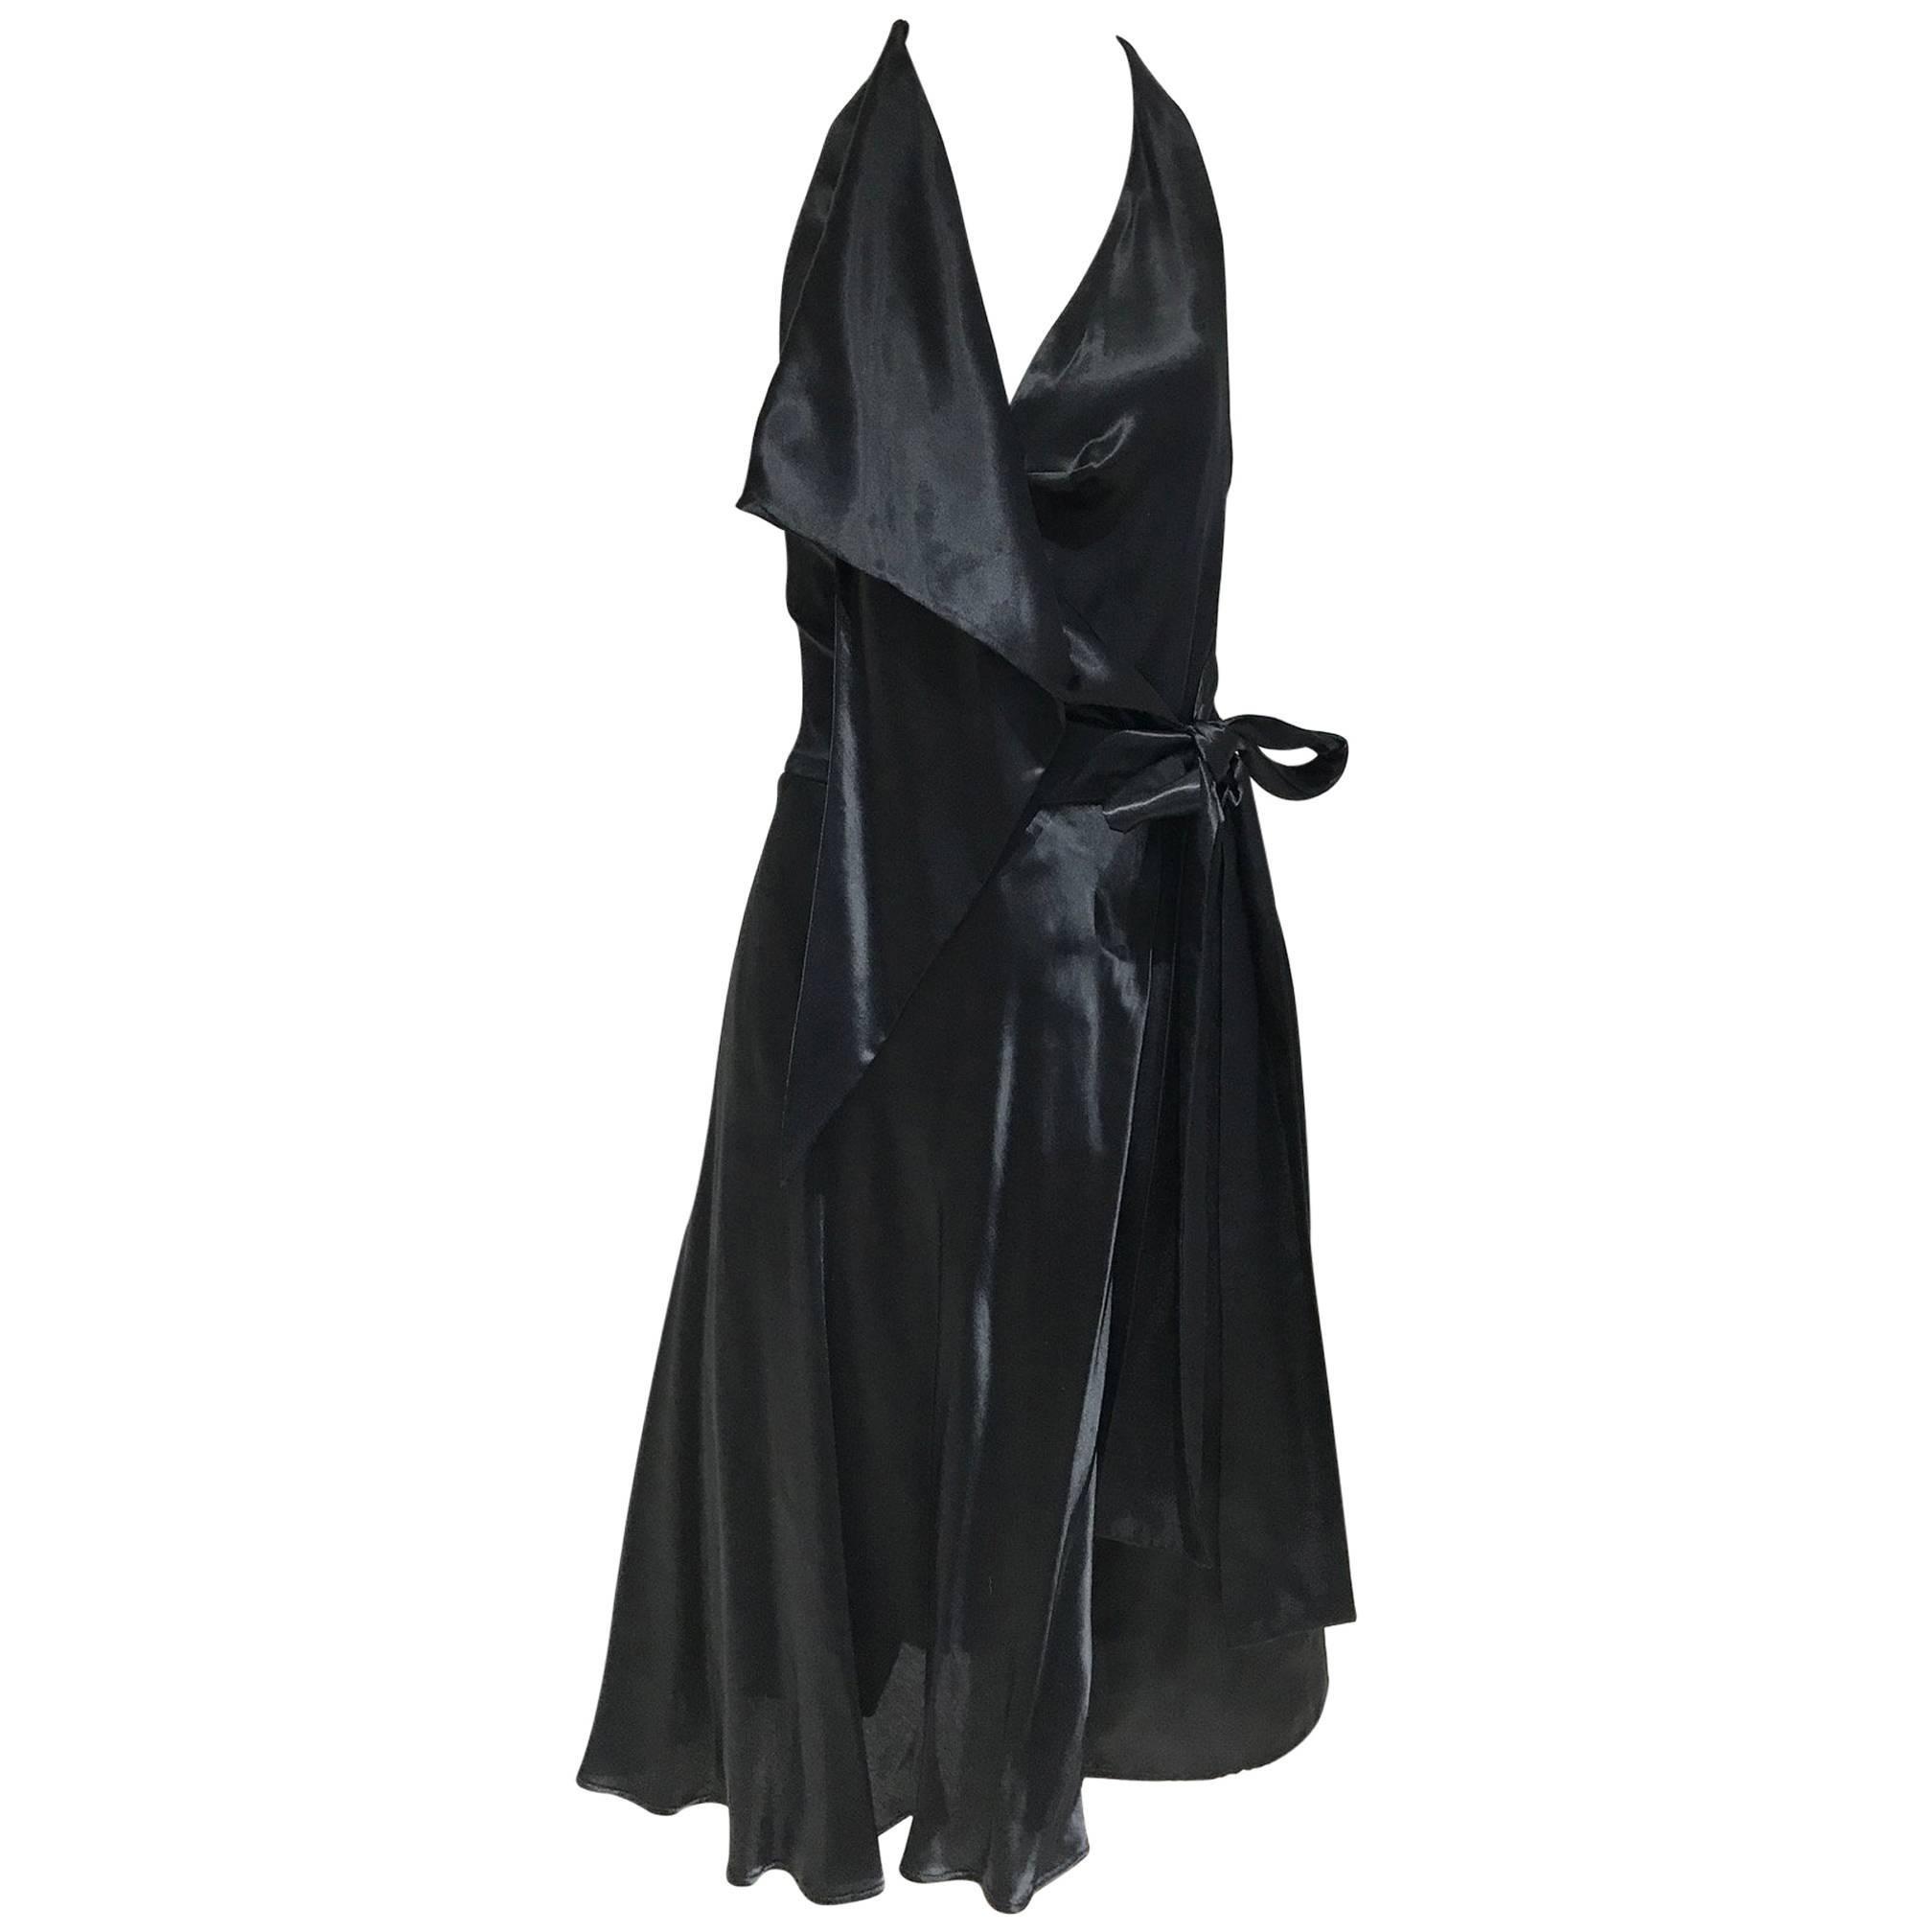 Vintage VIVIENNE WESTWOOD 1990s Black Silk Halter Wrap Dress